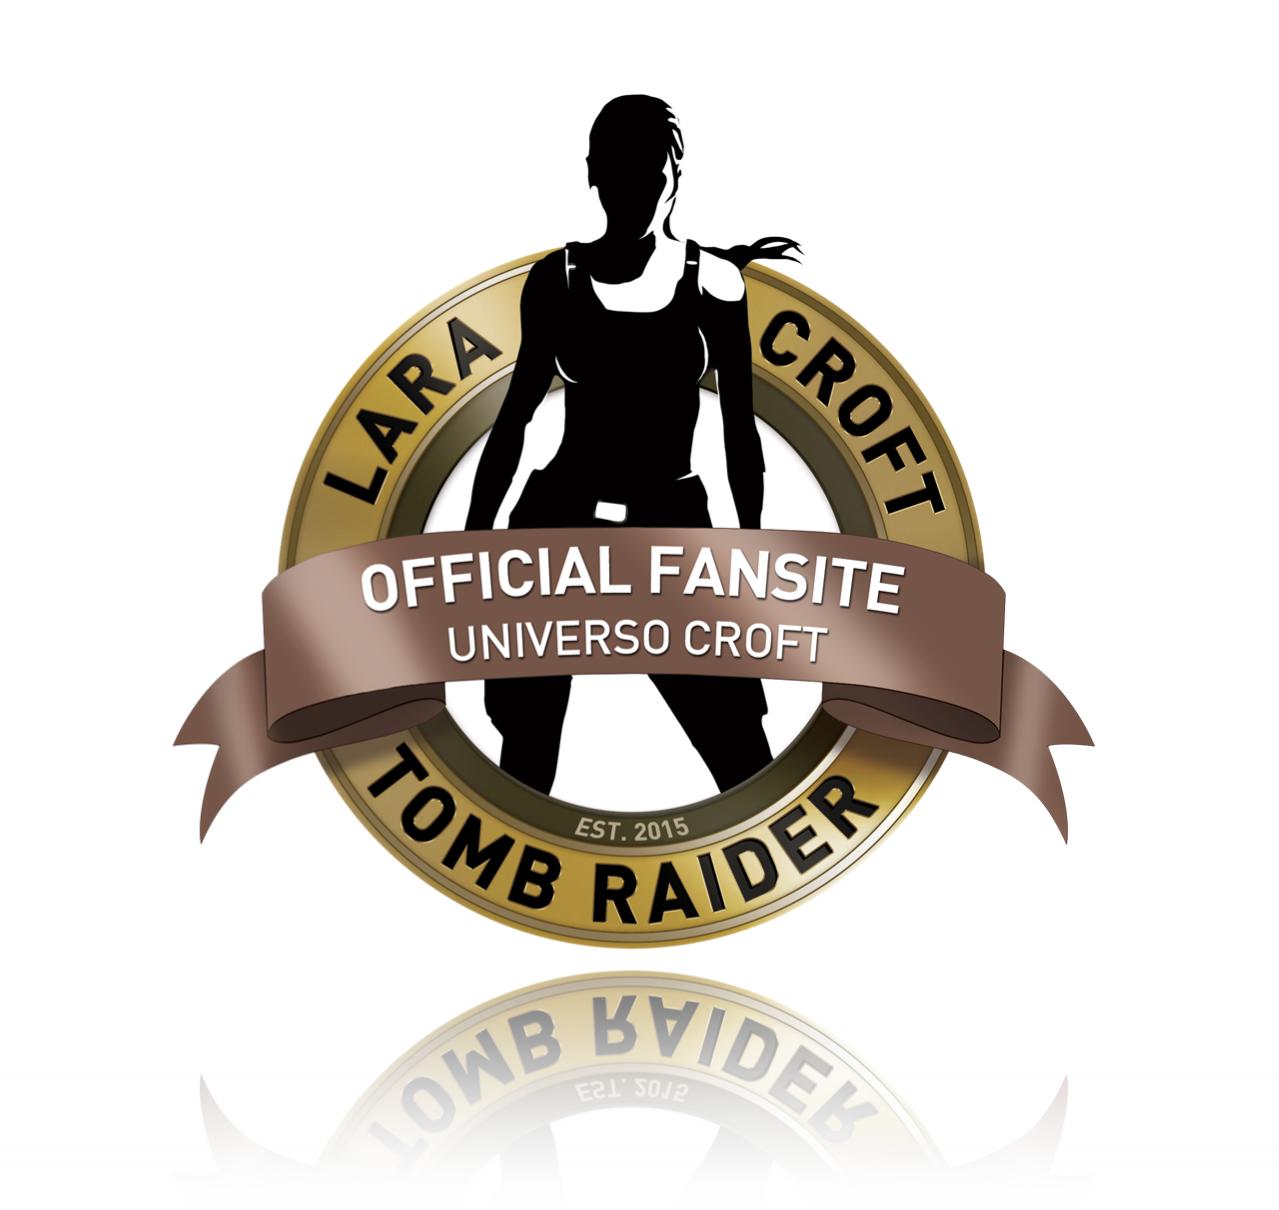 Fansite Oficial